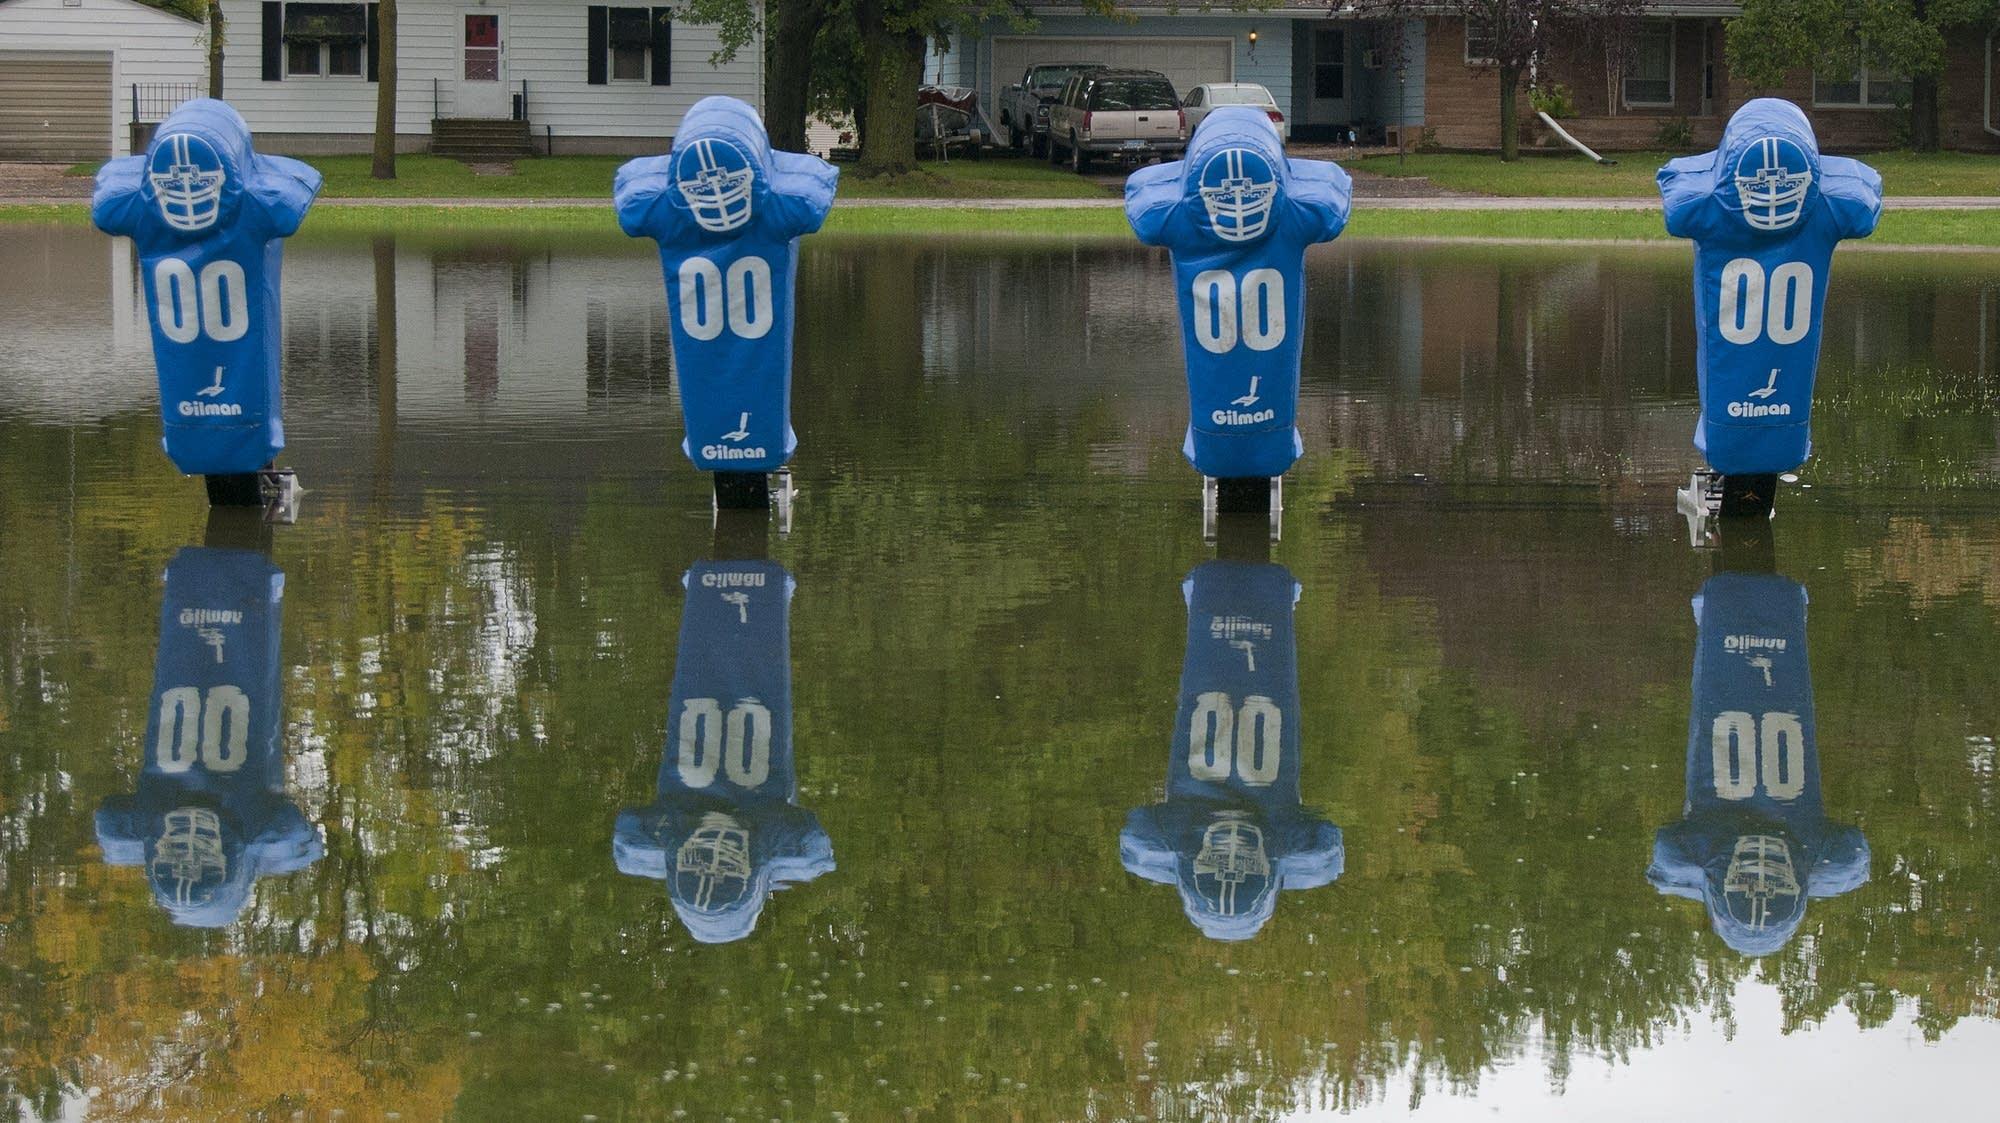 Football practice dummies sit in standing water.